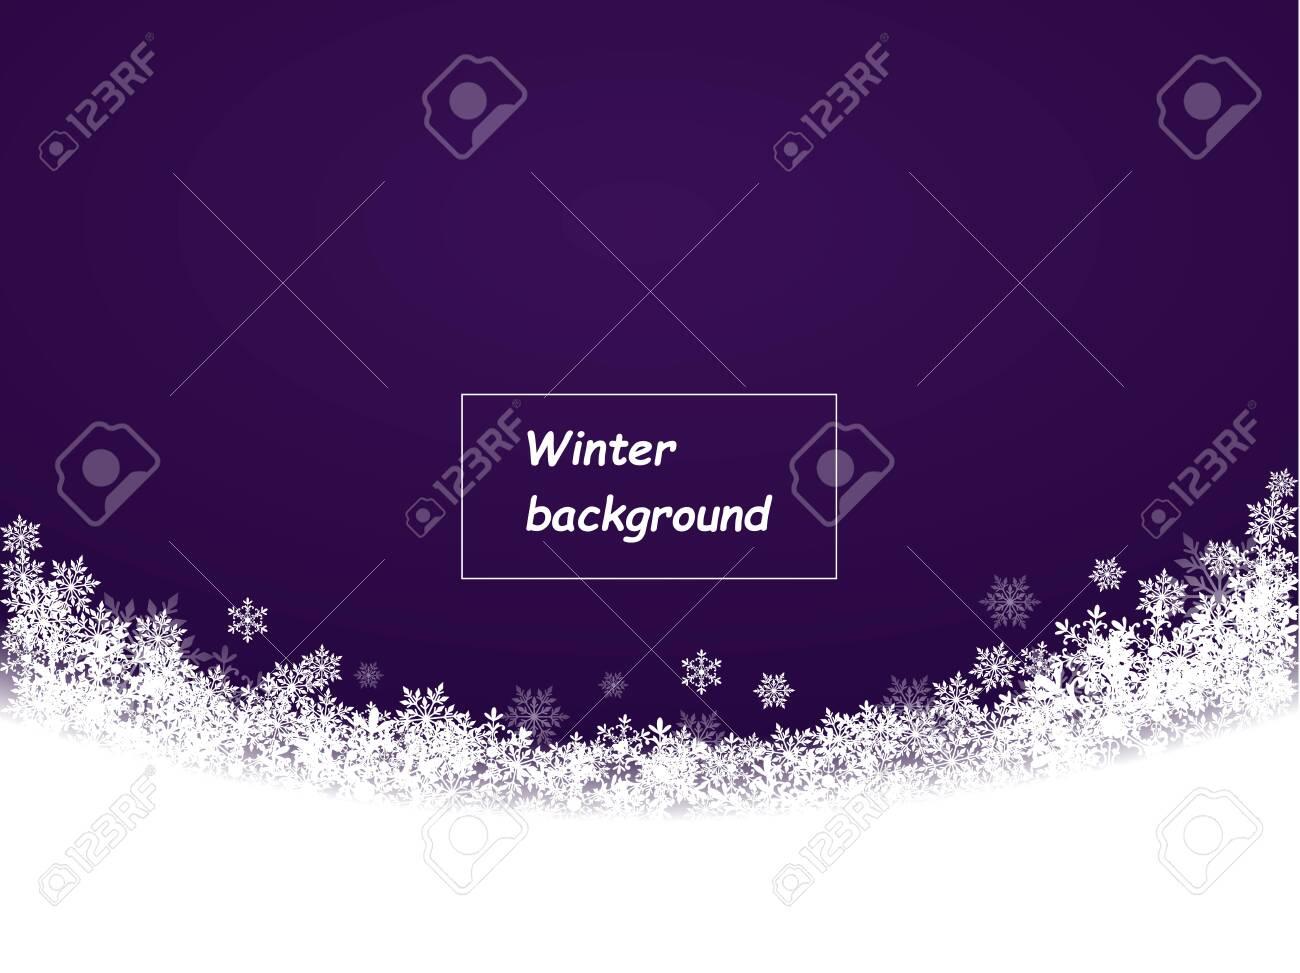 snowflakes beautifully fallen semicircle, dark purple background, winter background - 134780960